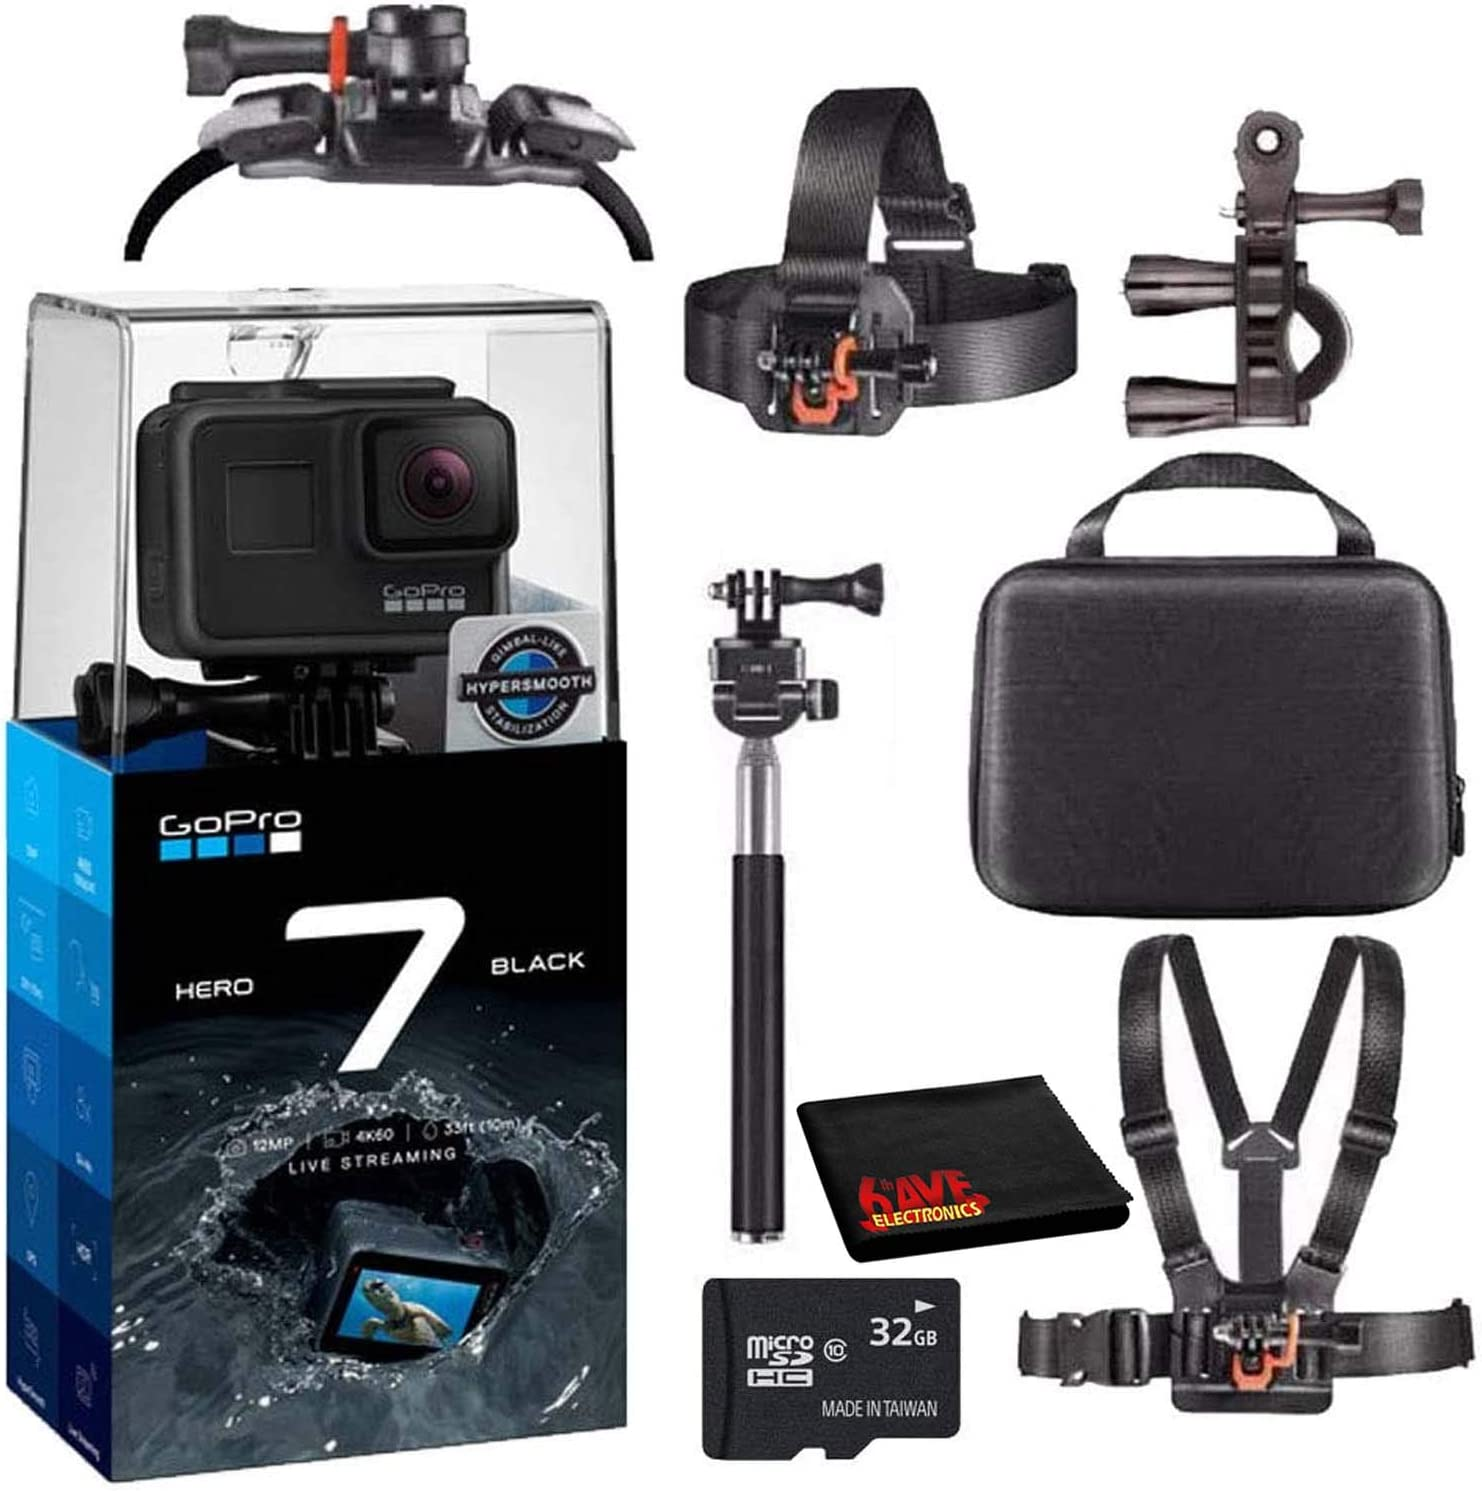 GoPro Hero7 Max 77% OFF Hero 7 Waterproof Bund Digital Starter Camera Action 4 years warranty